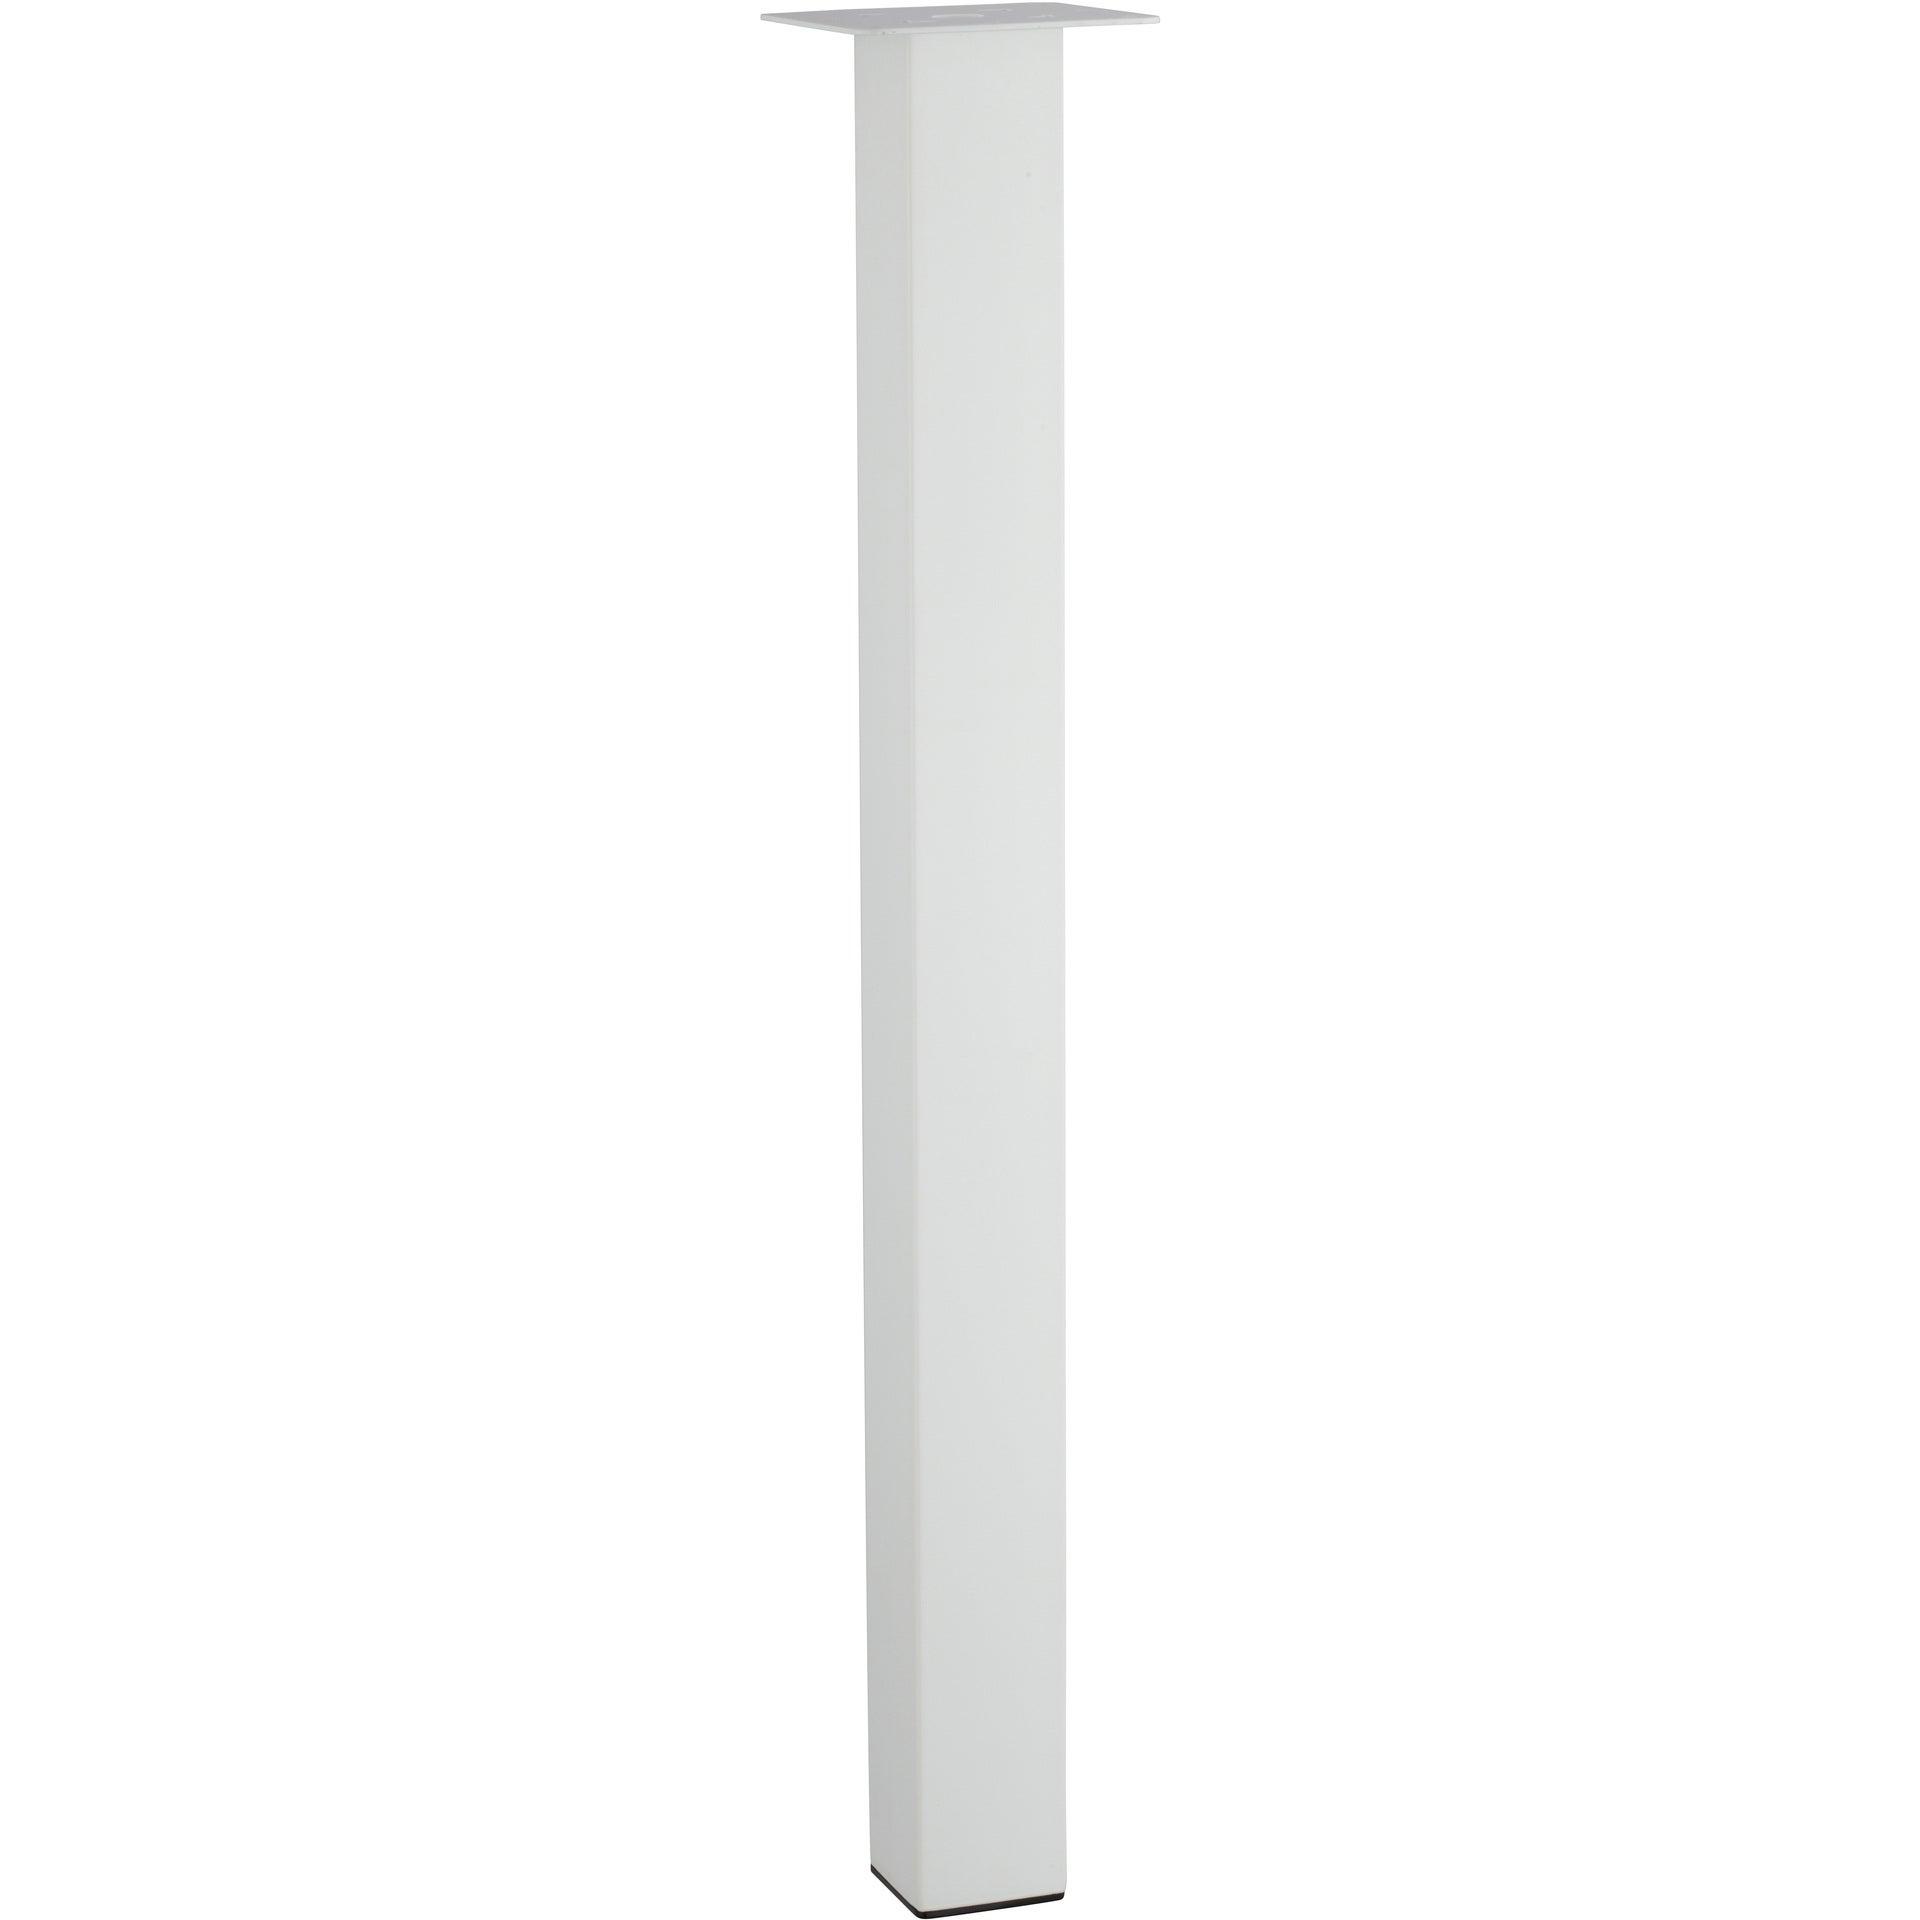 Pied Table Carre Reglable Acier Epoxy Blanc De 70 A 73 Cm Leroy